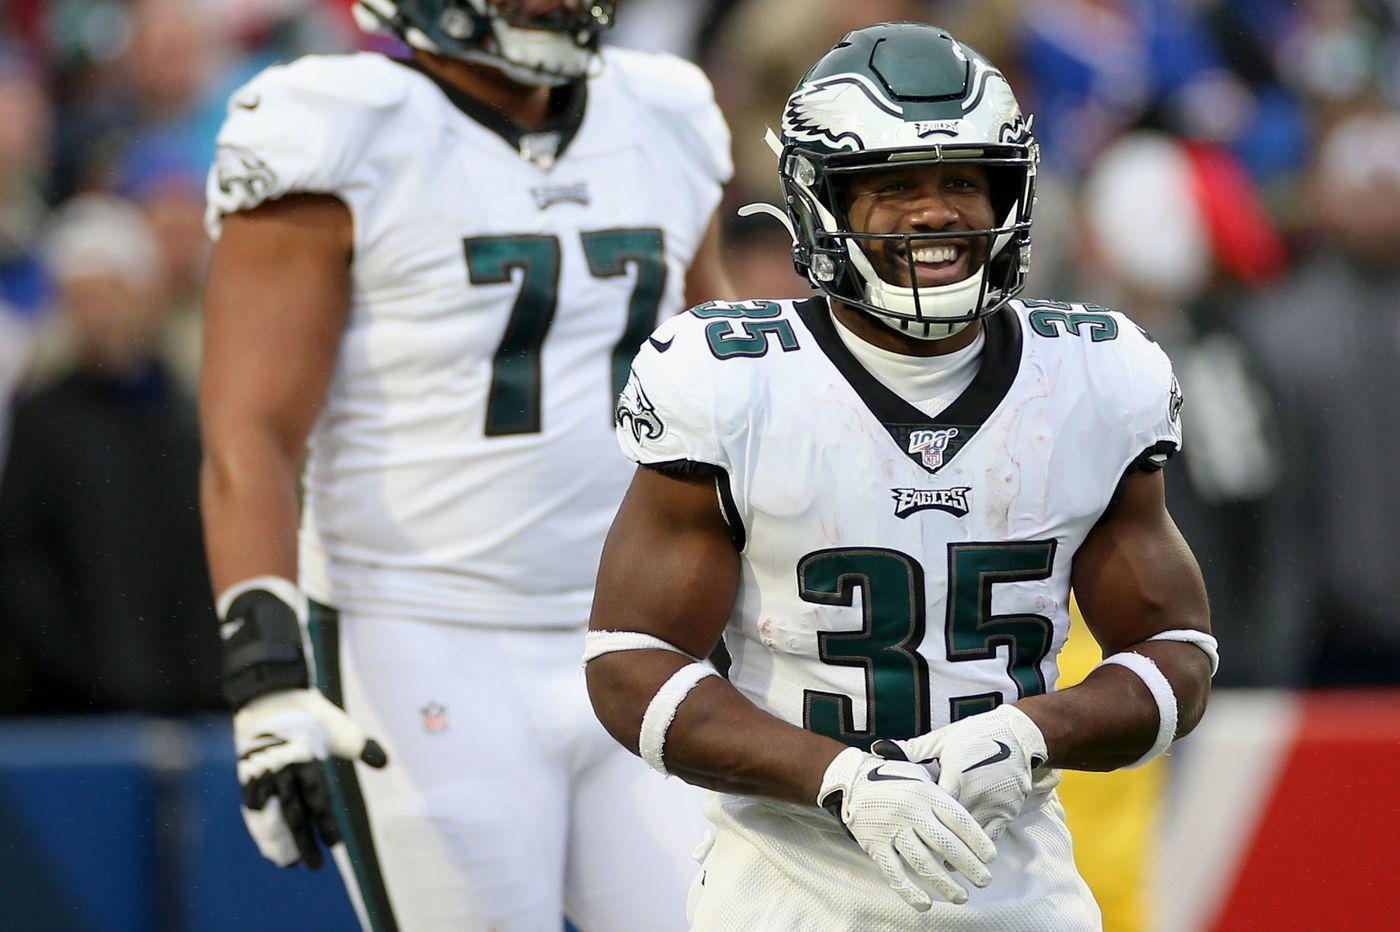 Eagles' Boston Scott keeps churning, through both good and bad moments